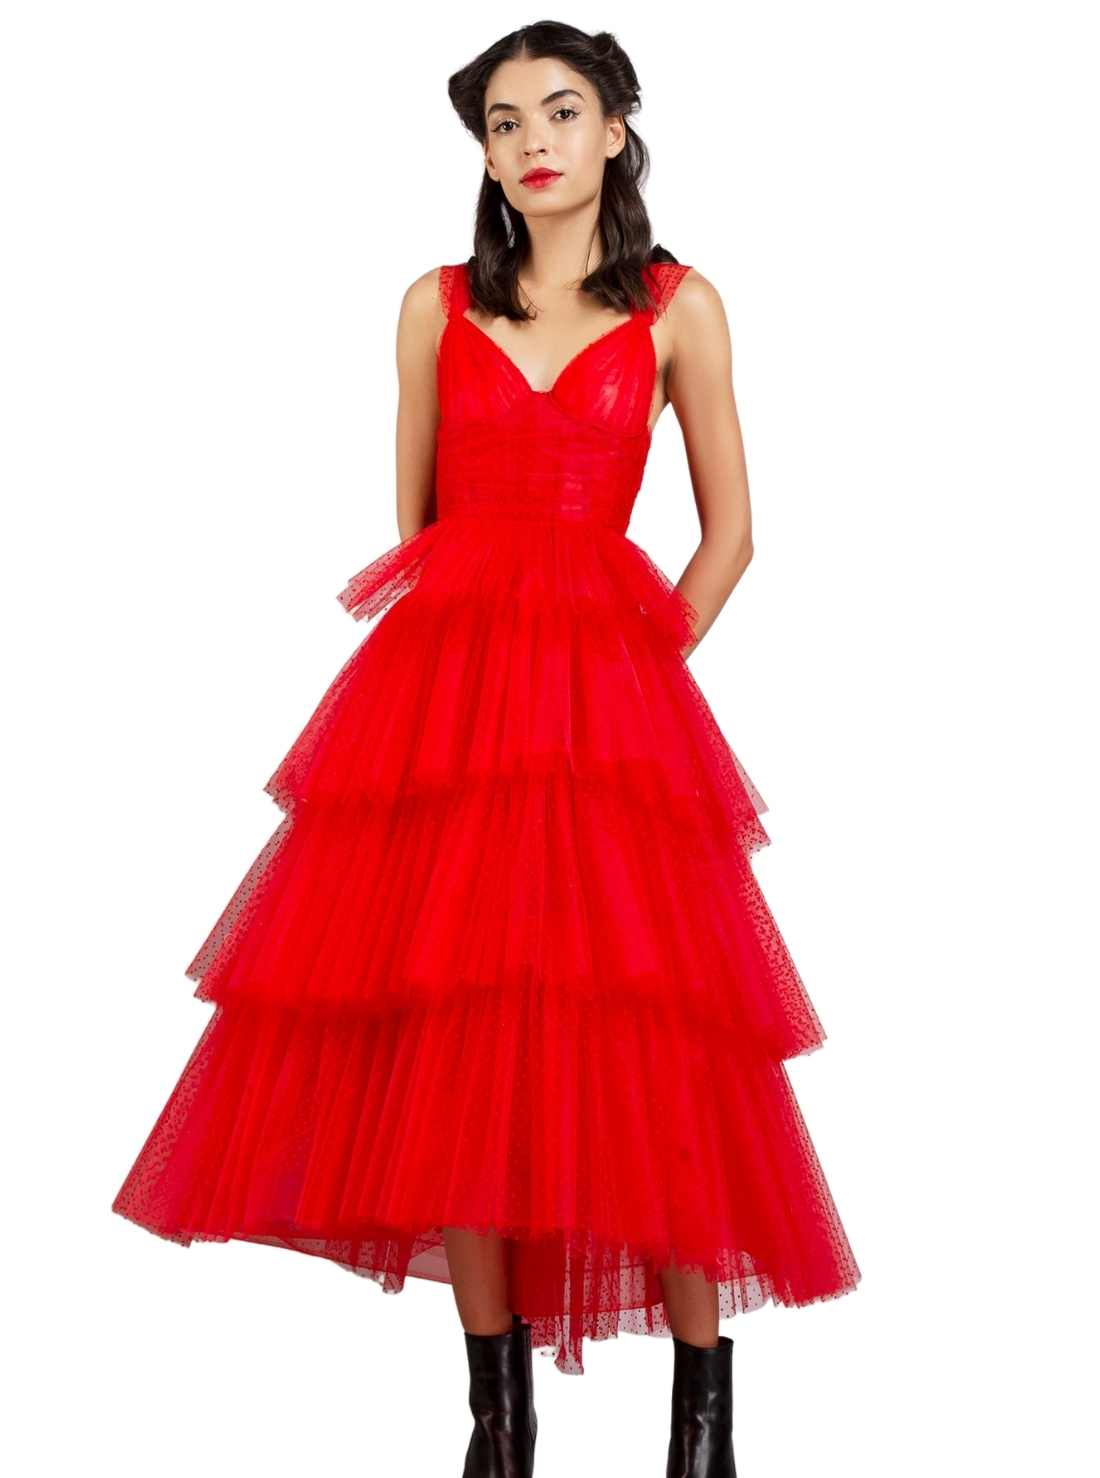 Red Layered Corset style Bodice Dress